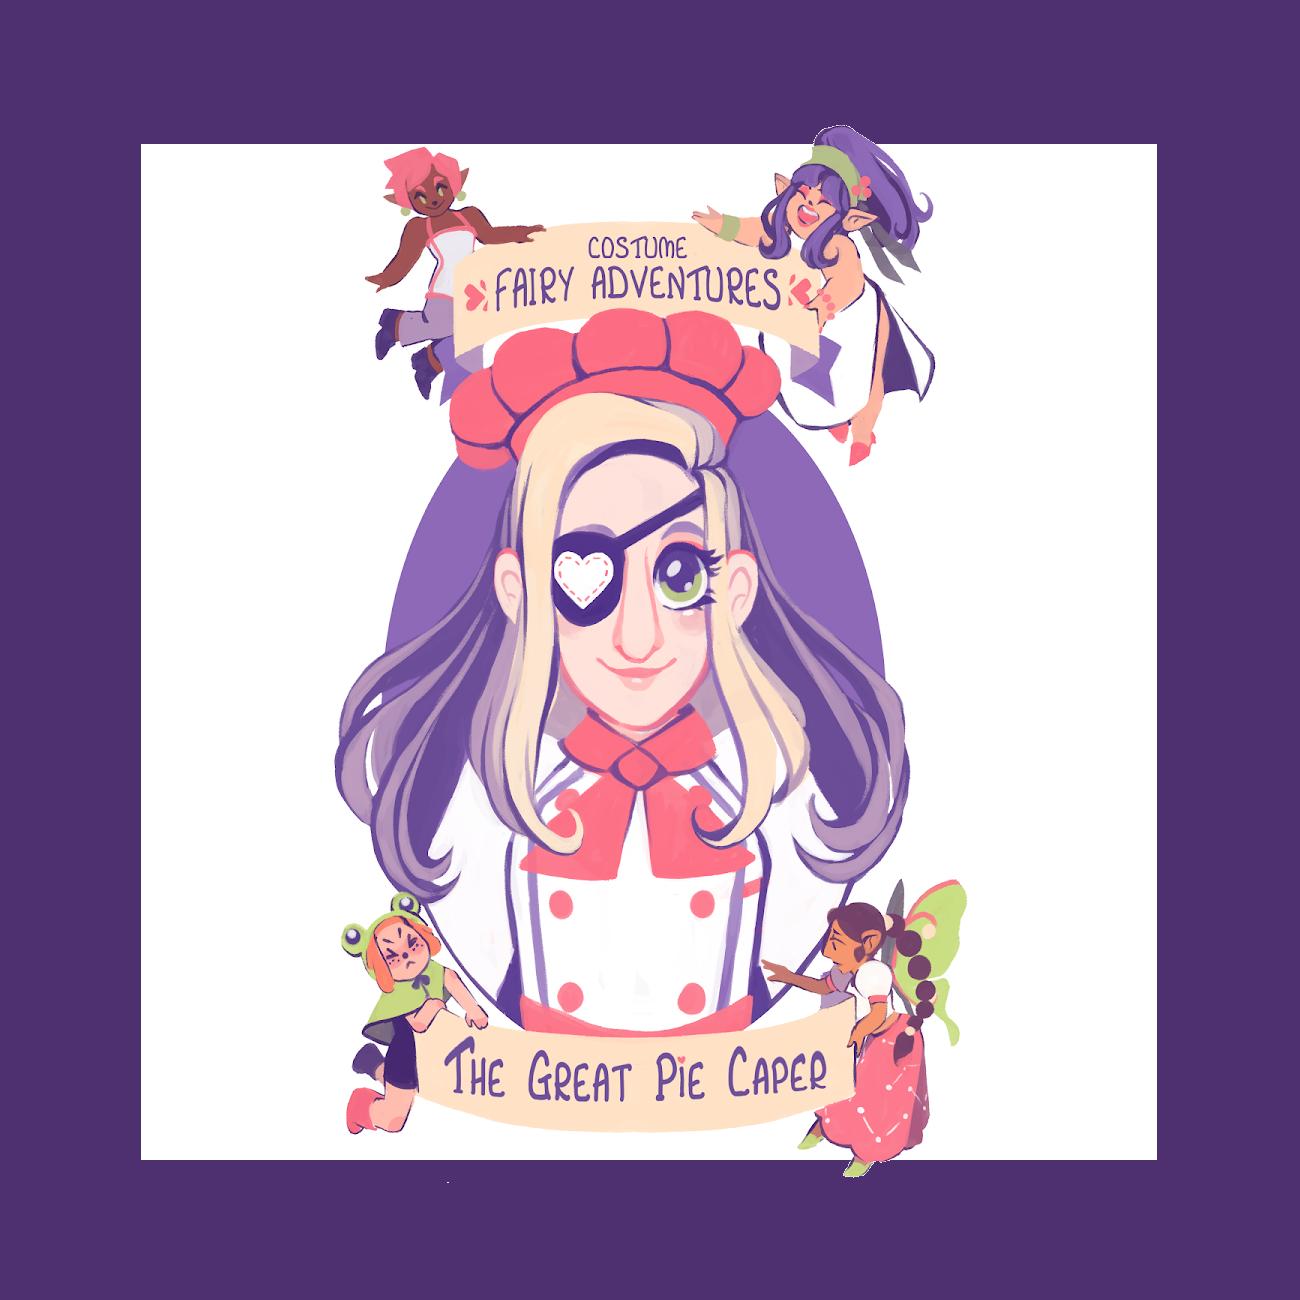 Costume Fairy Adventures: The Great Pie Caper - Bonus Feat 11.Mischief and meddling with fairies, in costumes, on adventures!